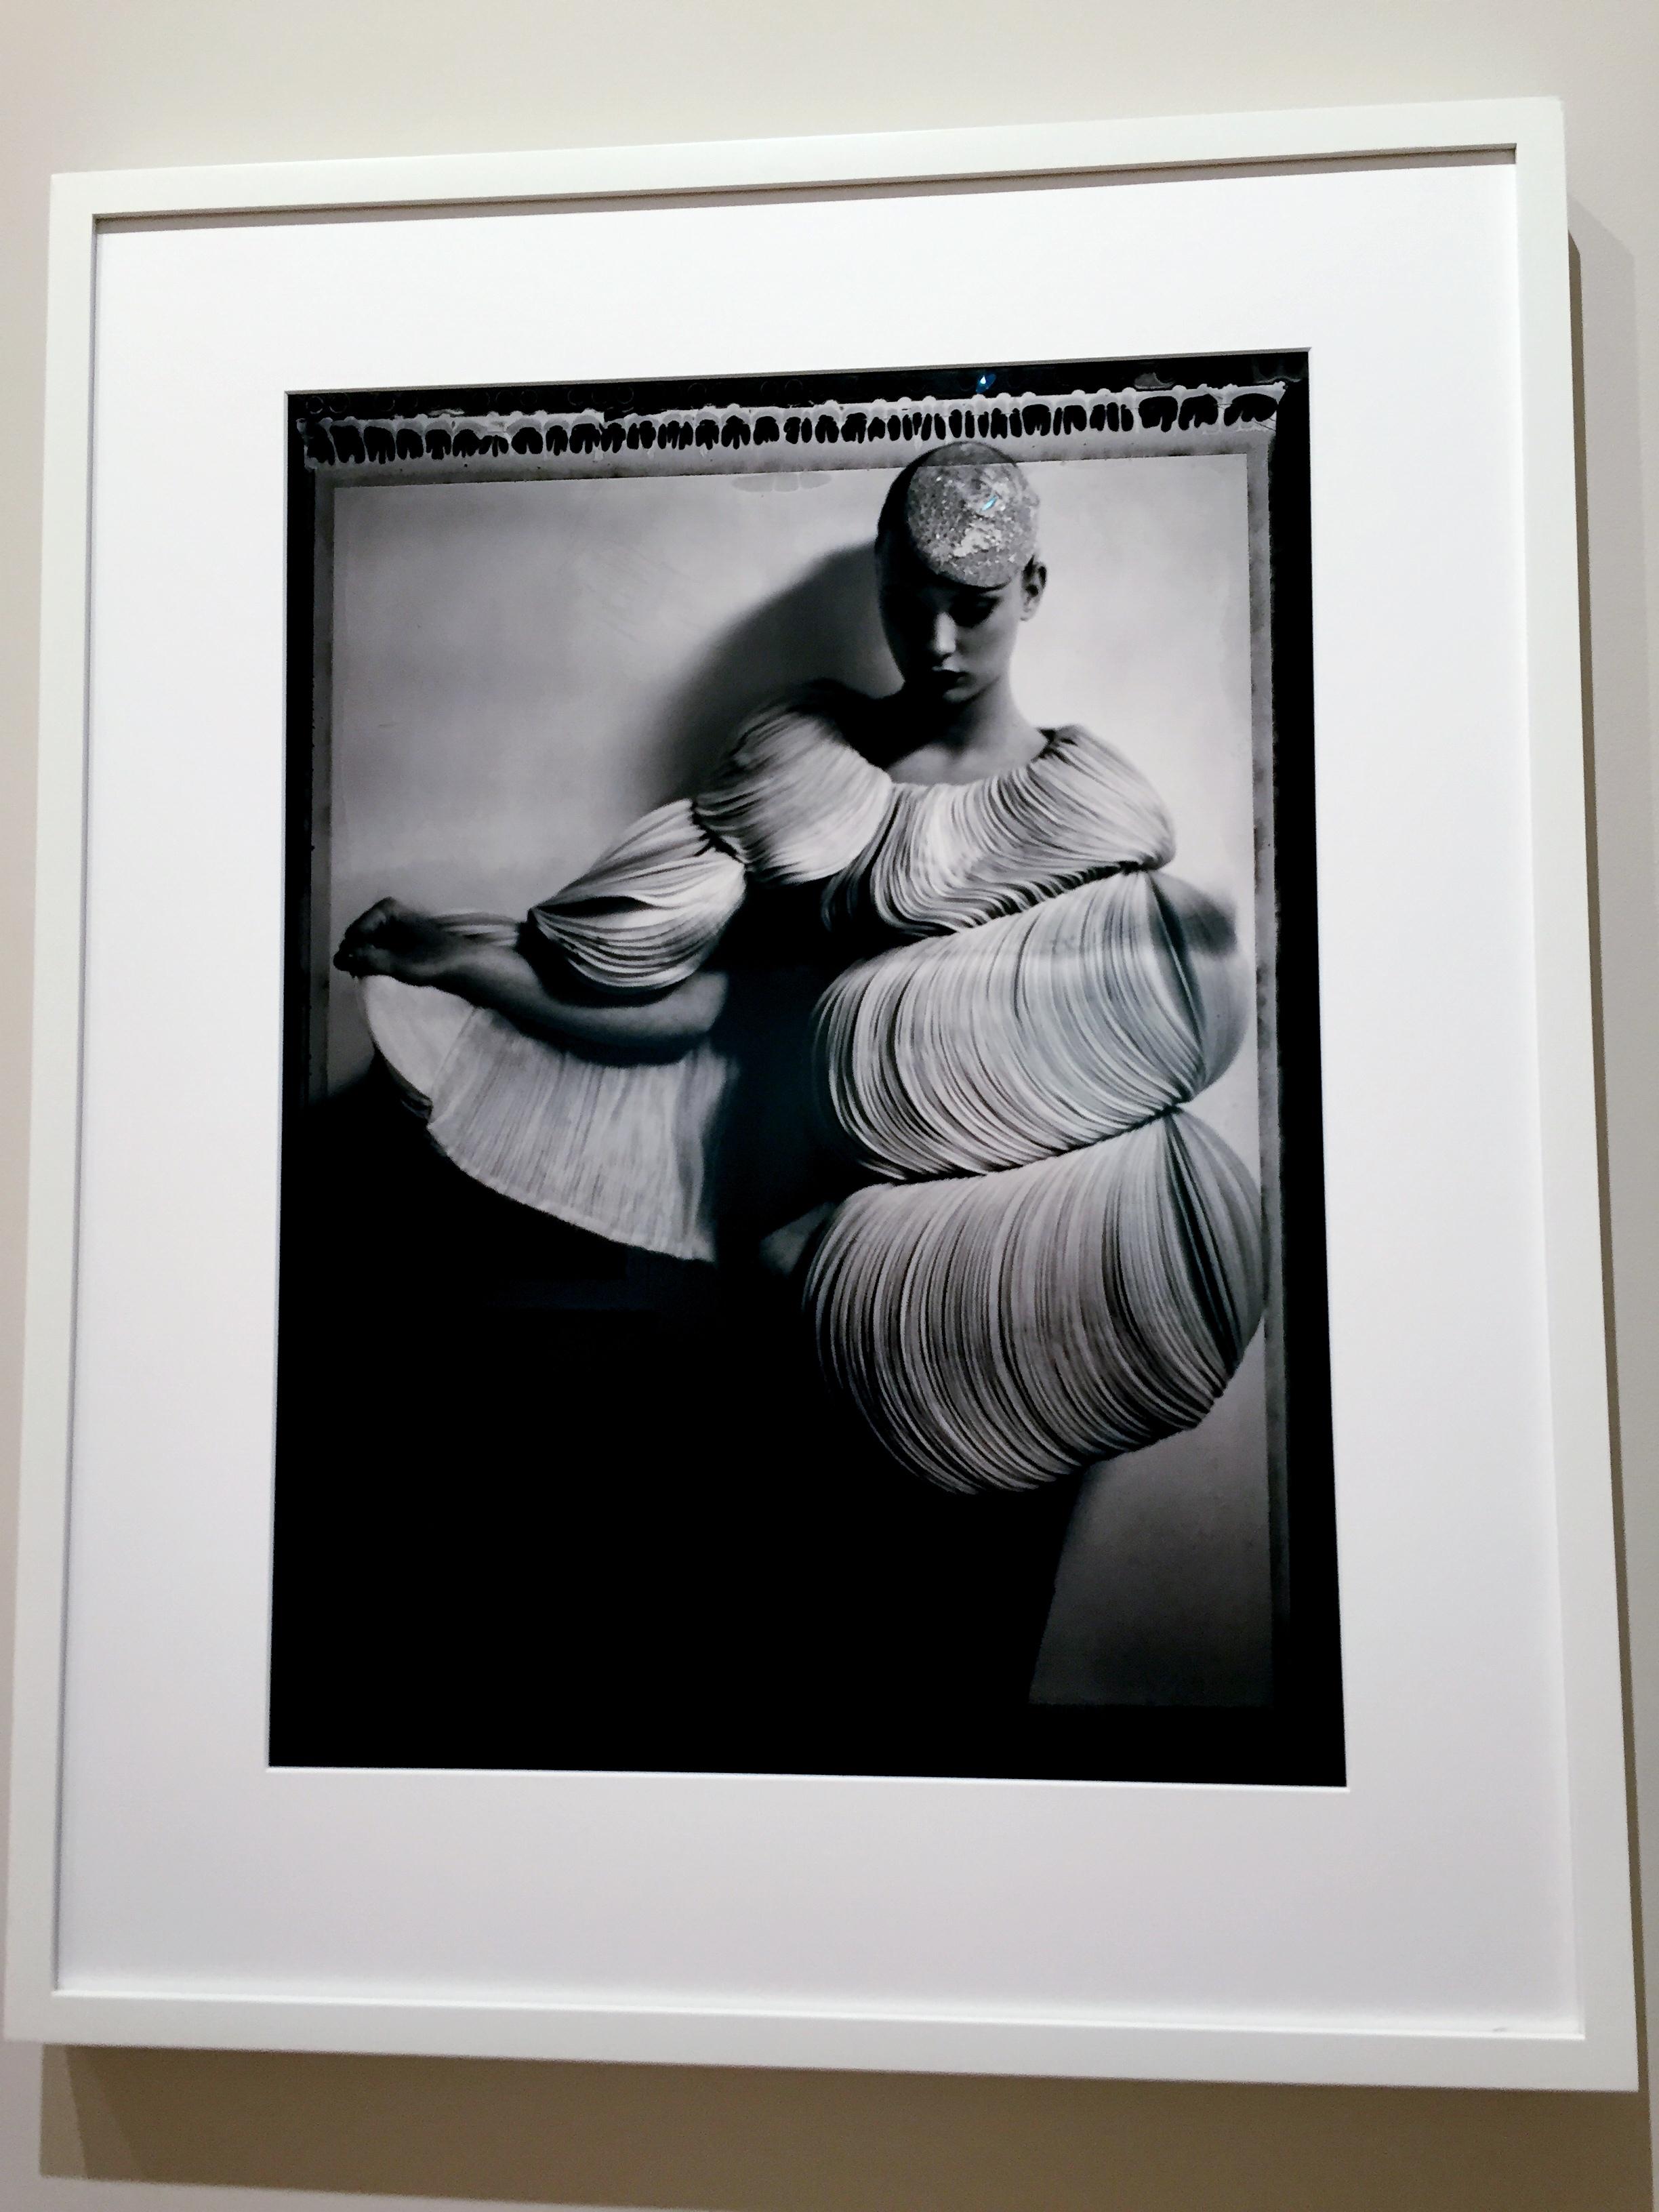 Cathleen Naundorf, Valentino en Rose, Valentino – Haute Couture Winter 2007 - N°59, 2007, Gelatin silver print, 24 x 20 inches (60 x 50 cm)